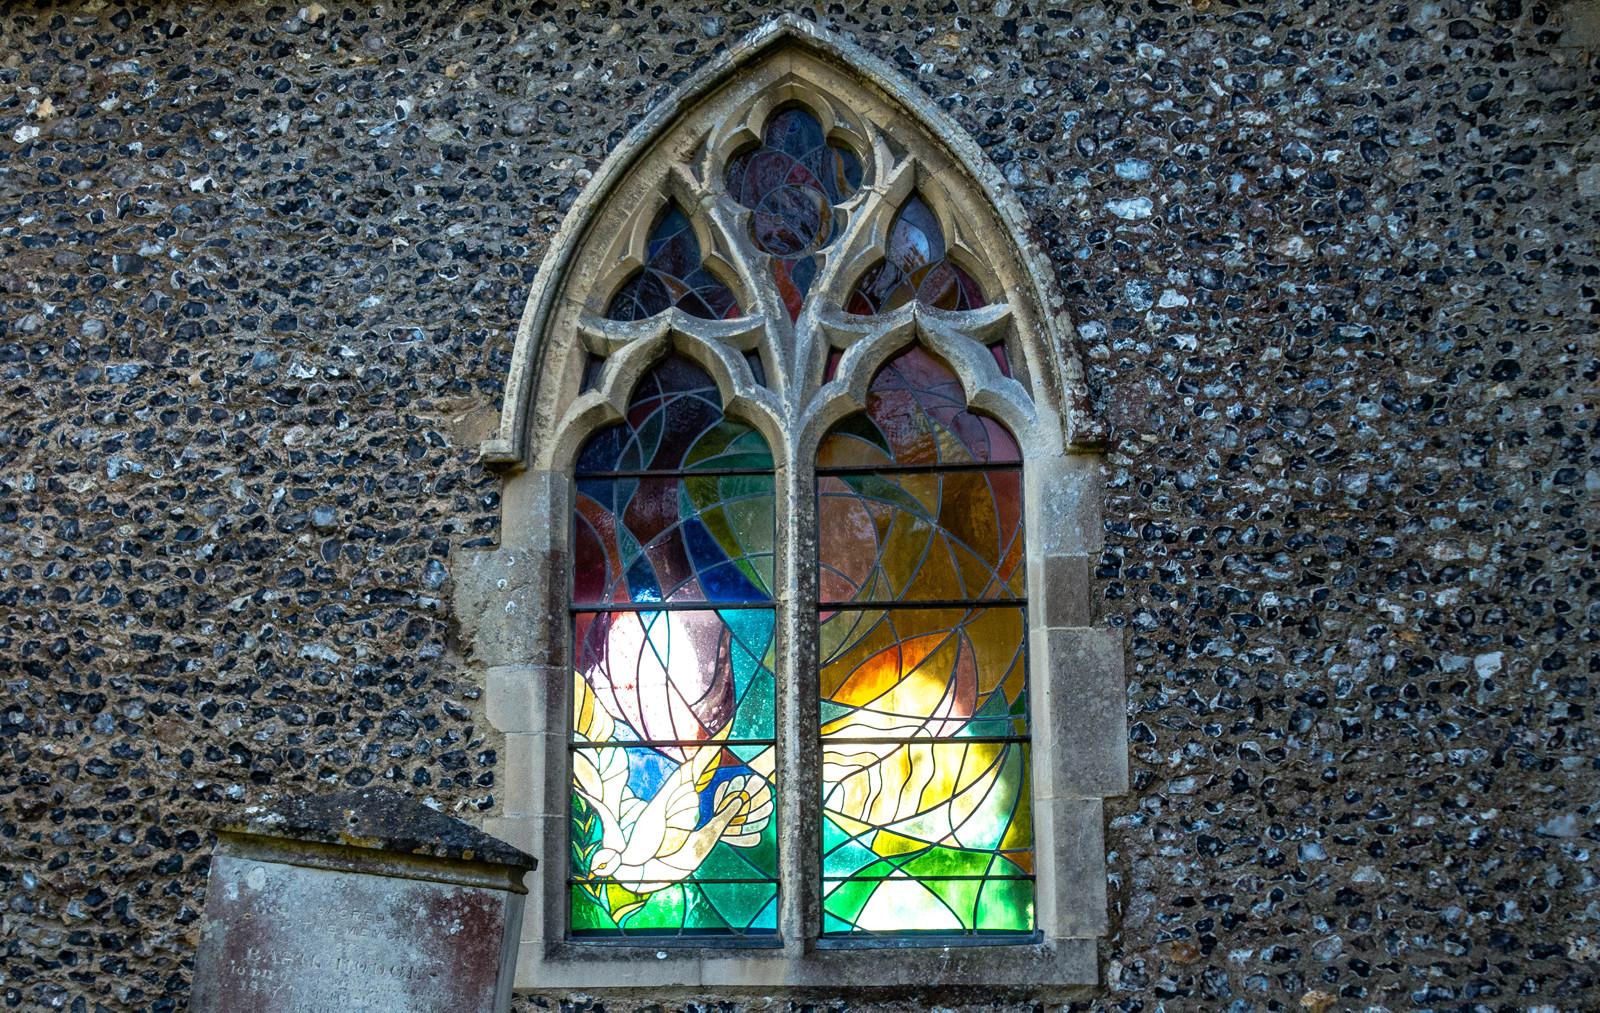 Barham window